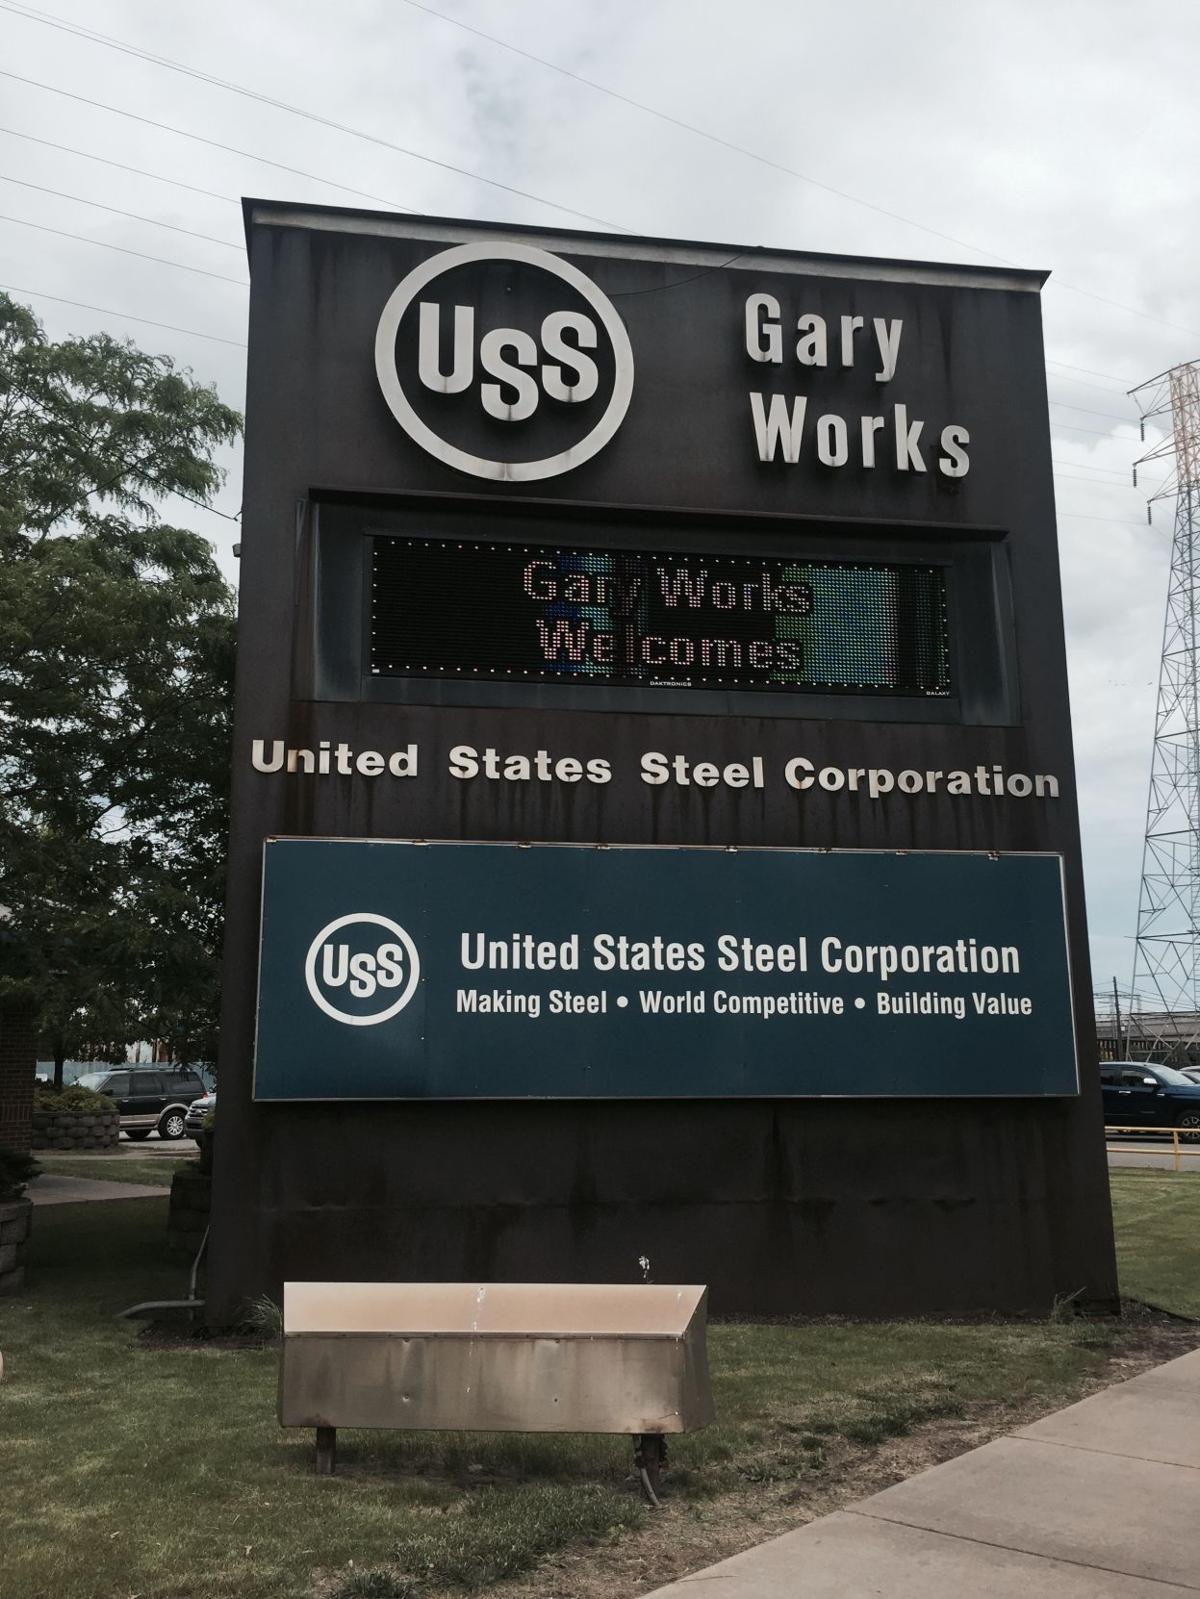 u s steel investing in gary works to restart granite city hot strip northwest indiana. Black Bedroom Furniture Sets. Home Design Ideas